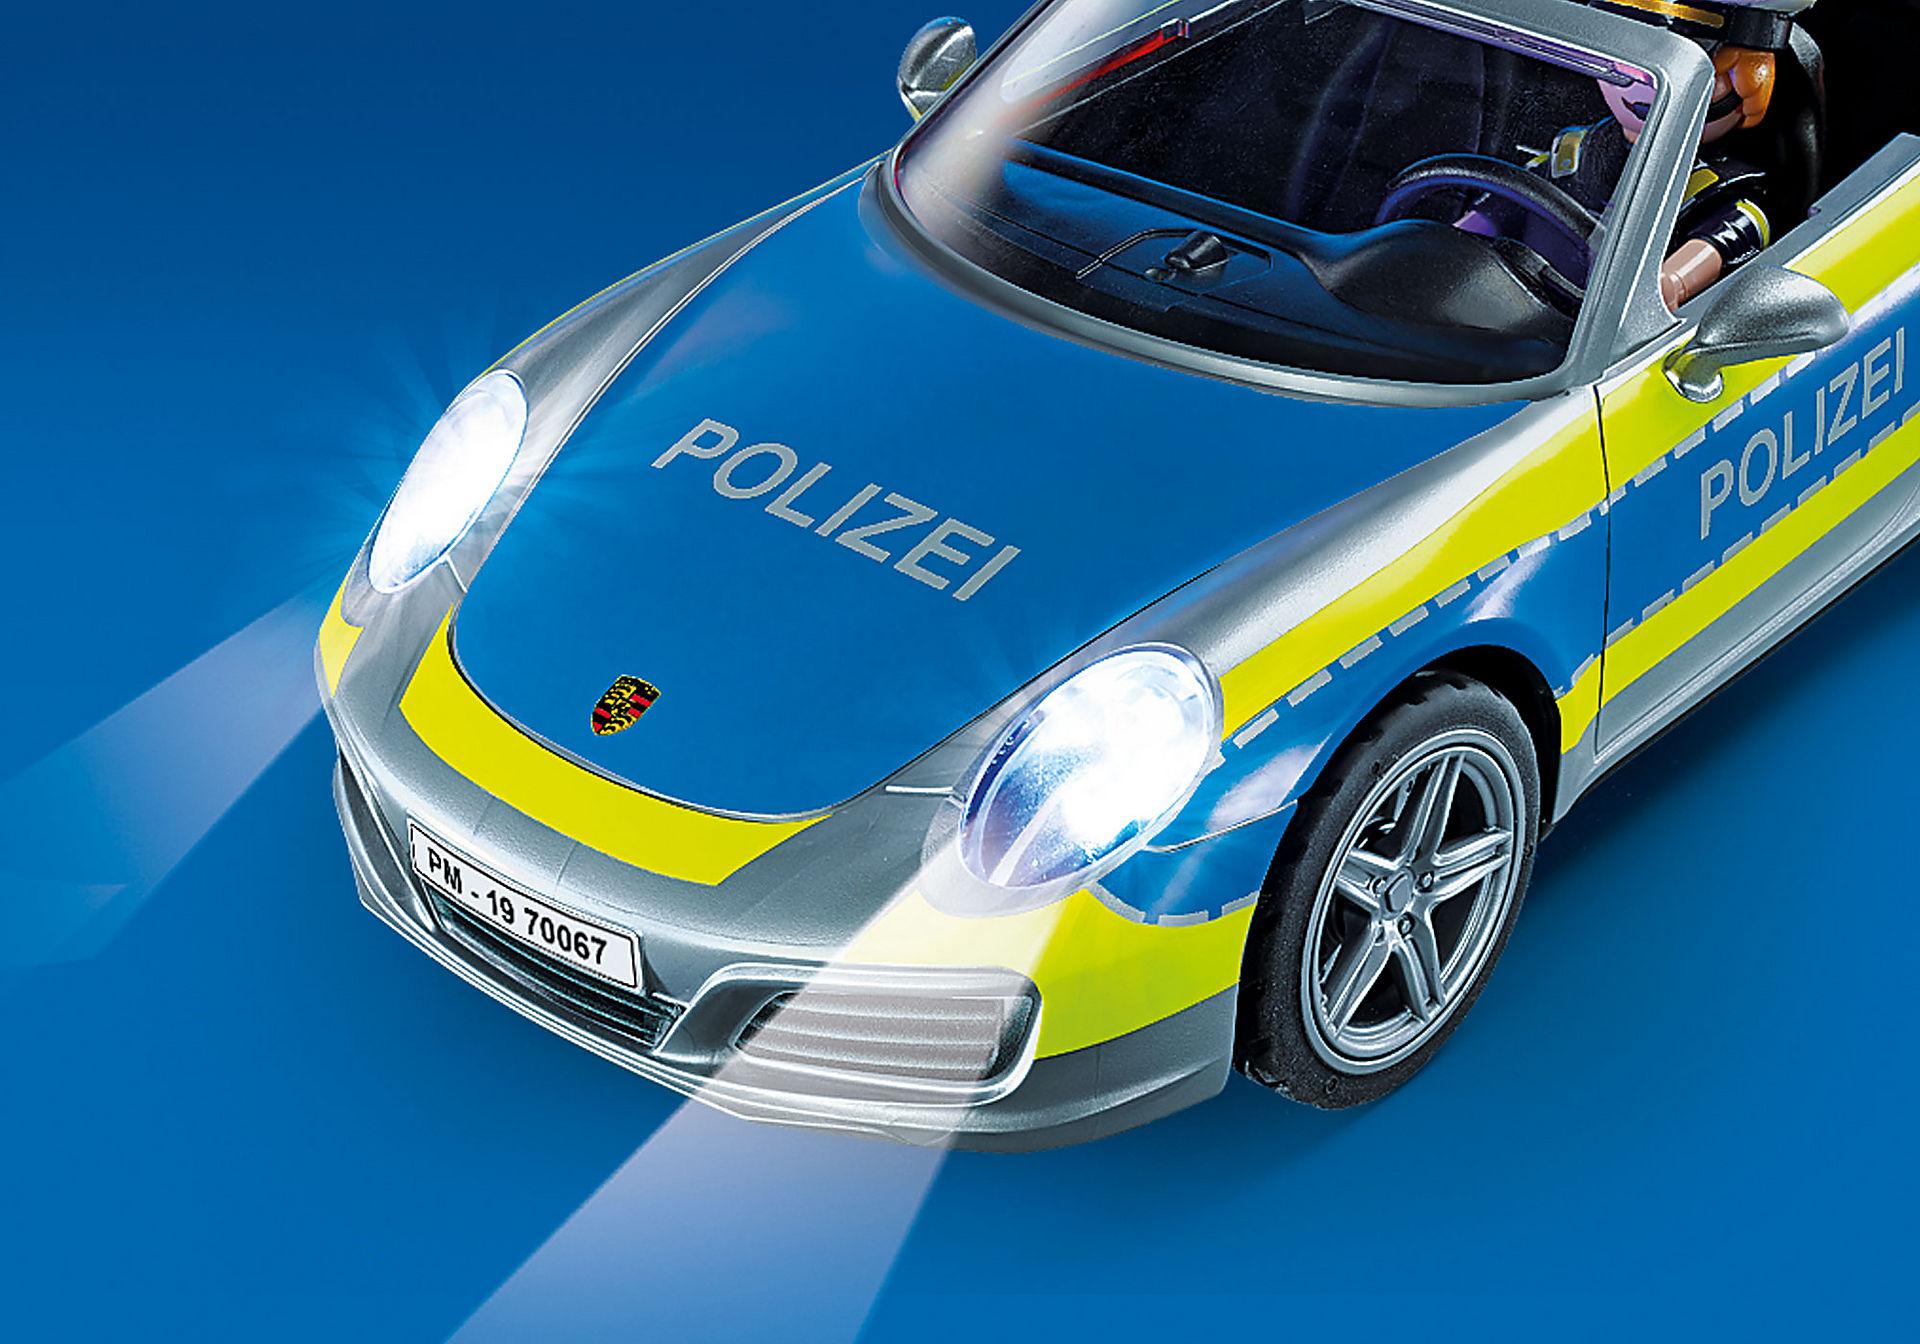 70067 Porsche 911 Carrera 4S Polizei zoom image6